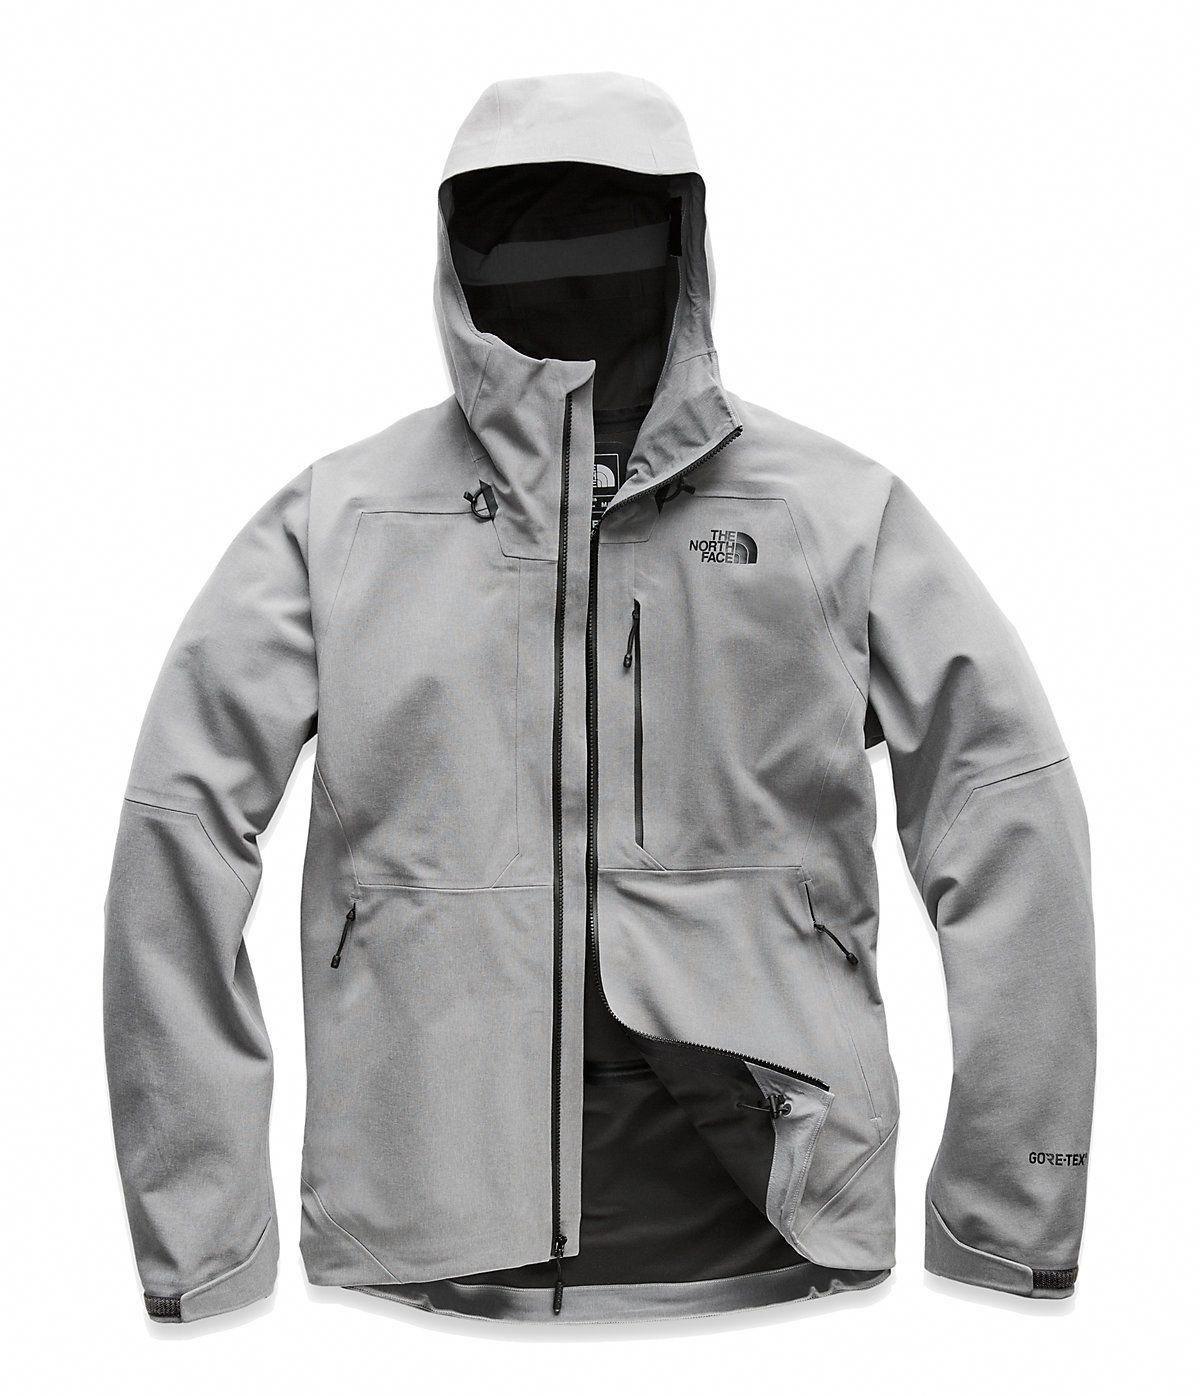 Womensyellow Slicker Raincoat Raincoatinspanish Code 9898748562 Raincoatsaleinsrilanka North Face Jacket Mens Rain Jacket Jackets [ 1396 x 1200 Pixel ]